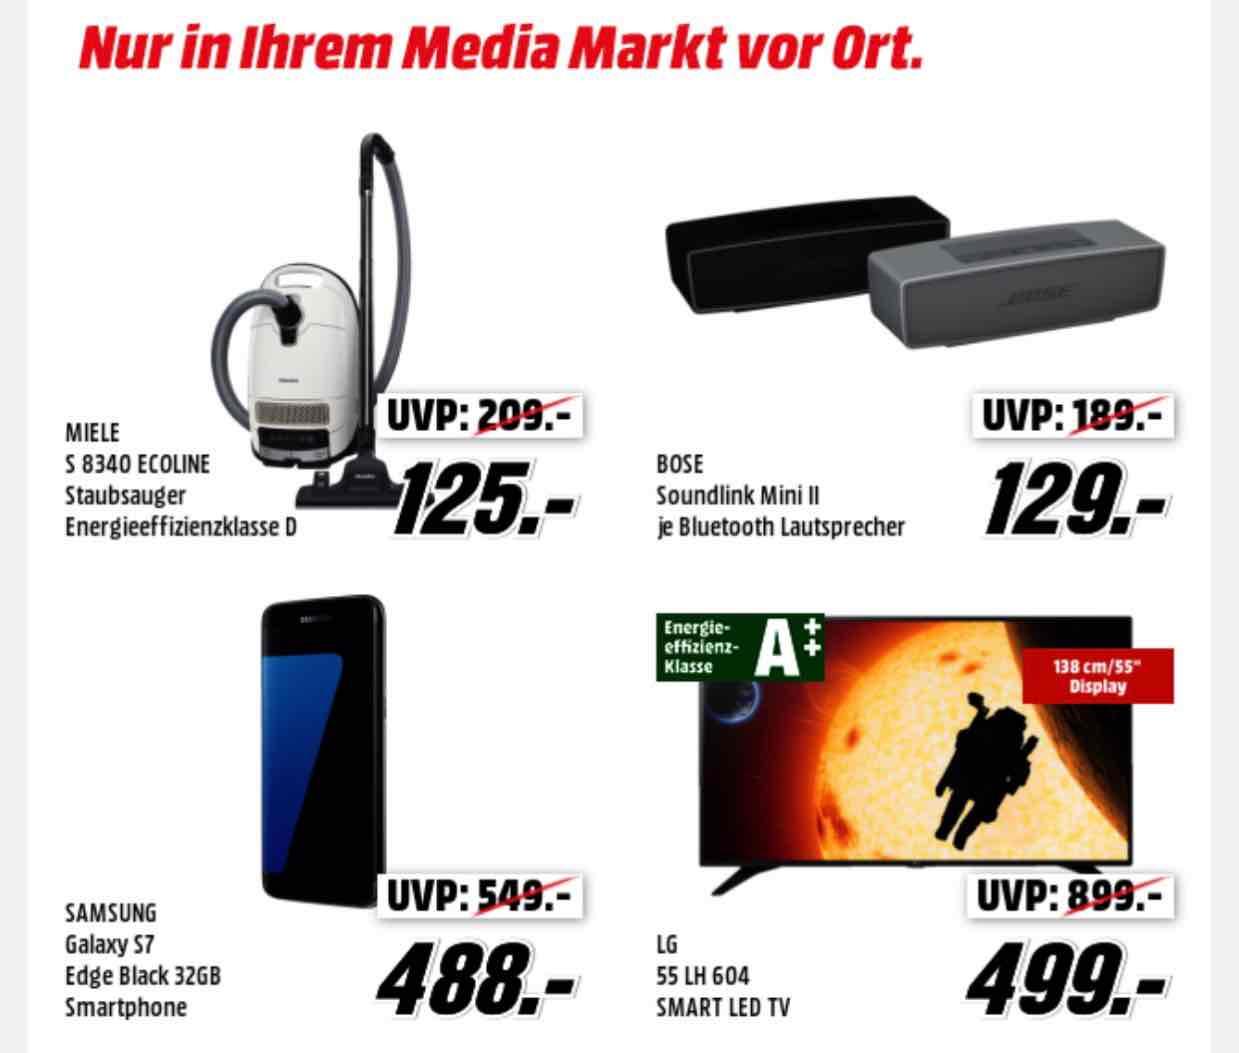 Lokal [ Media Märke Hamburg ] Bose Soundlink Mini ll für 129€